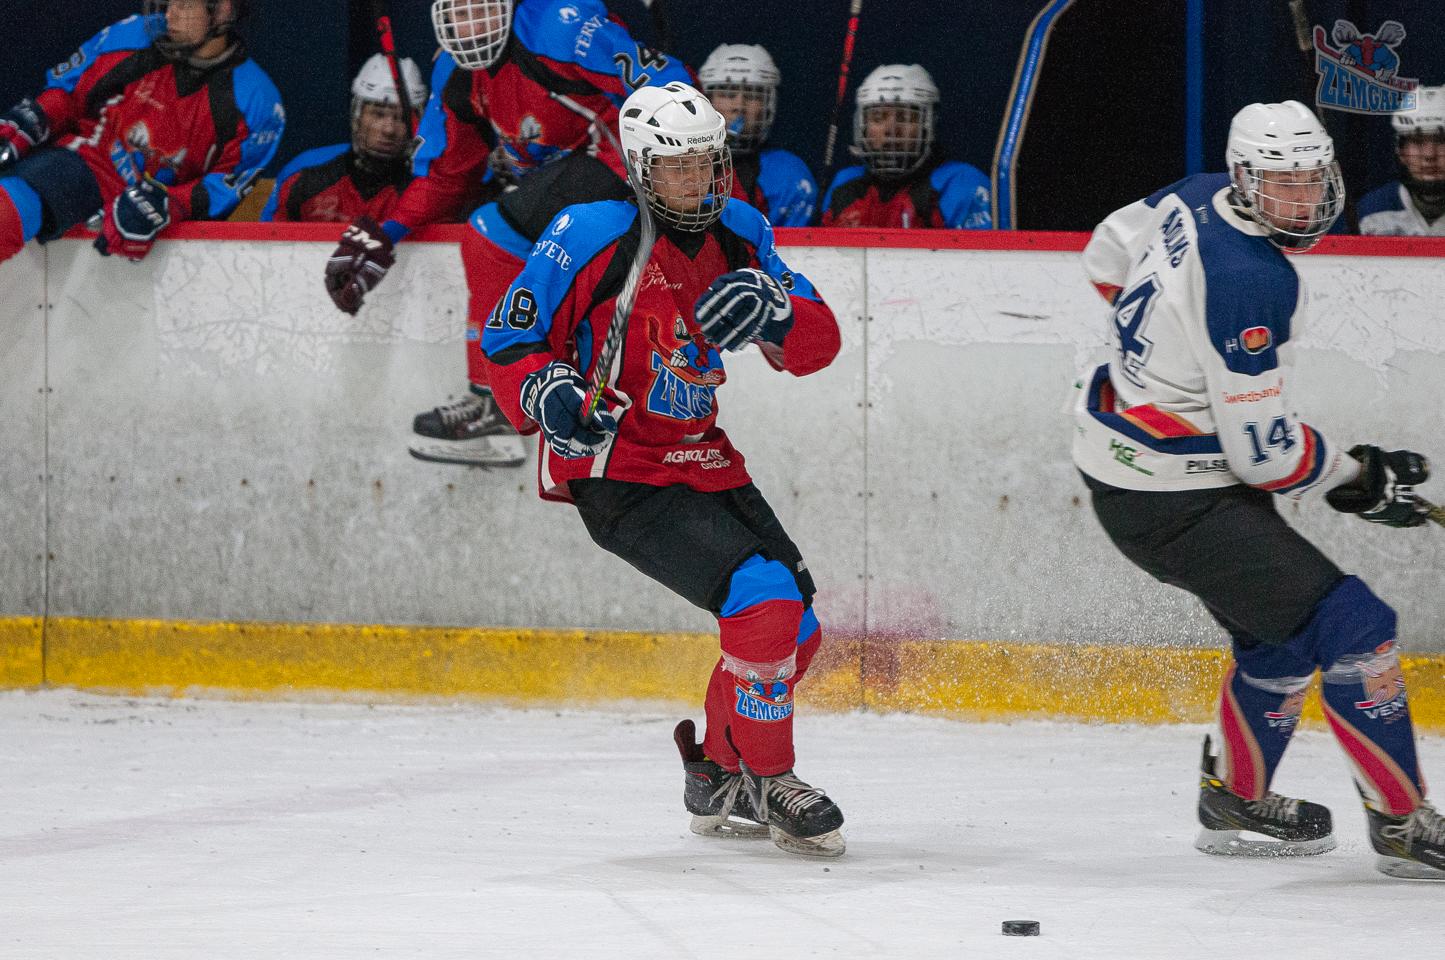 Jelgavas hokeja skola JLSS U17 - Venta 2002 14092019-03